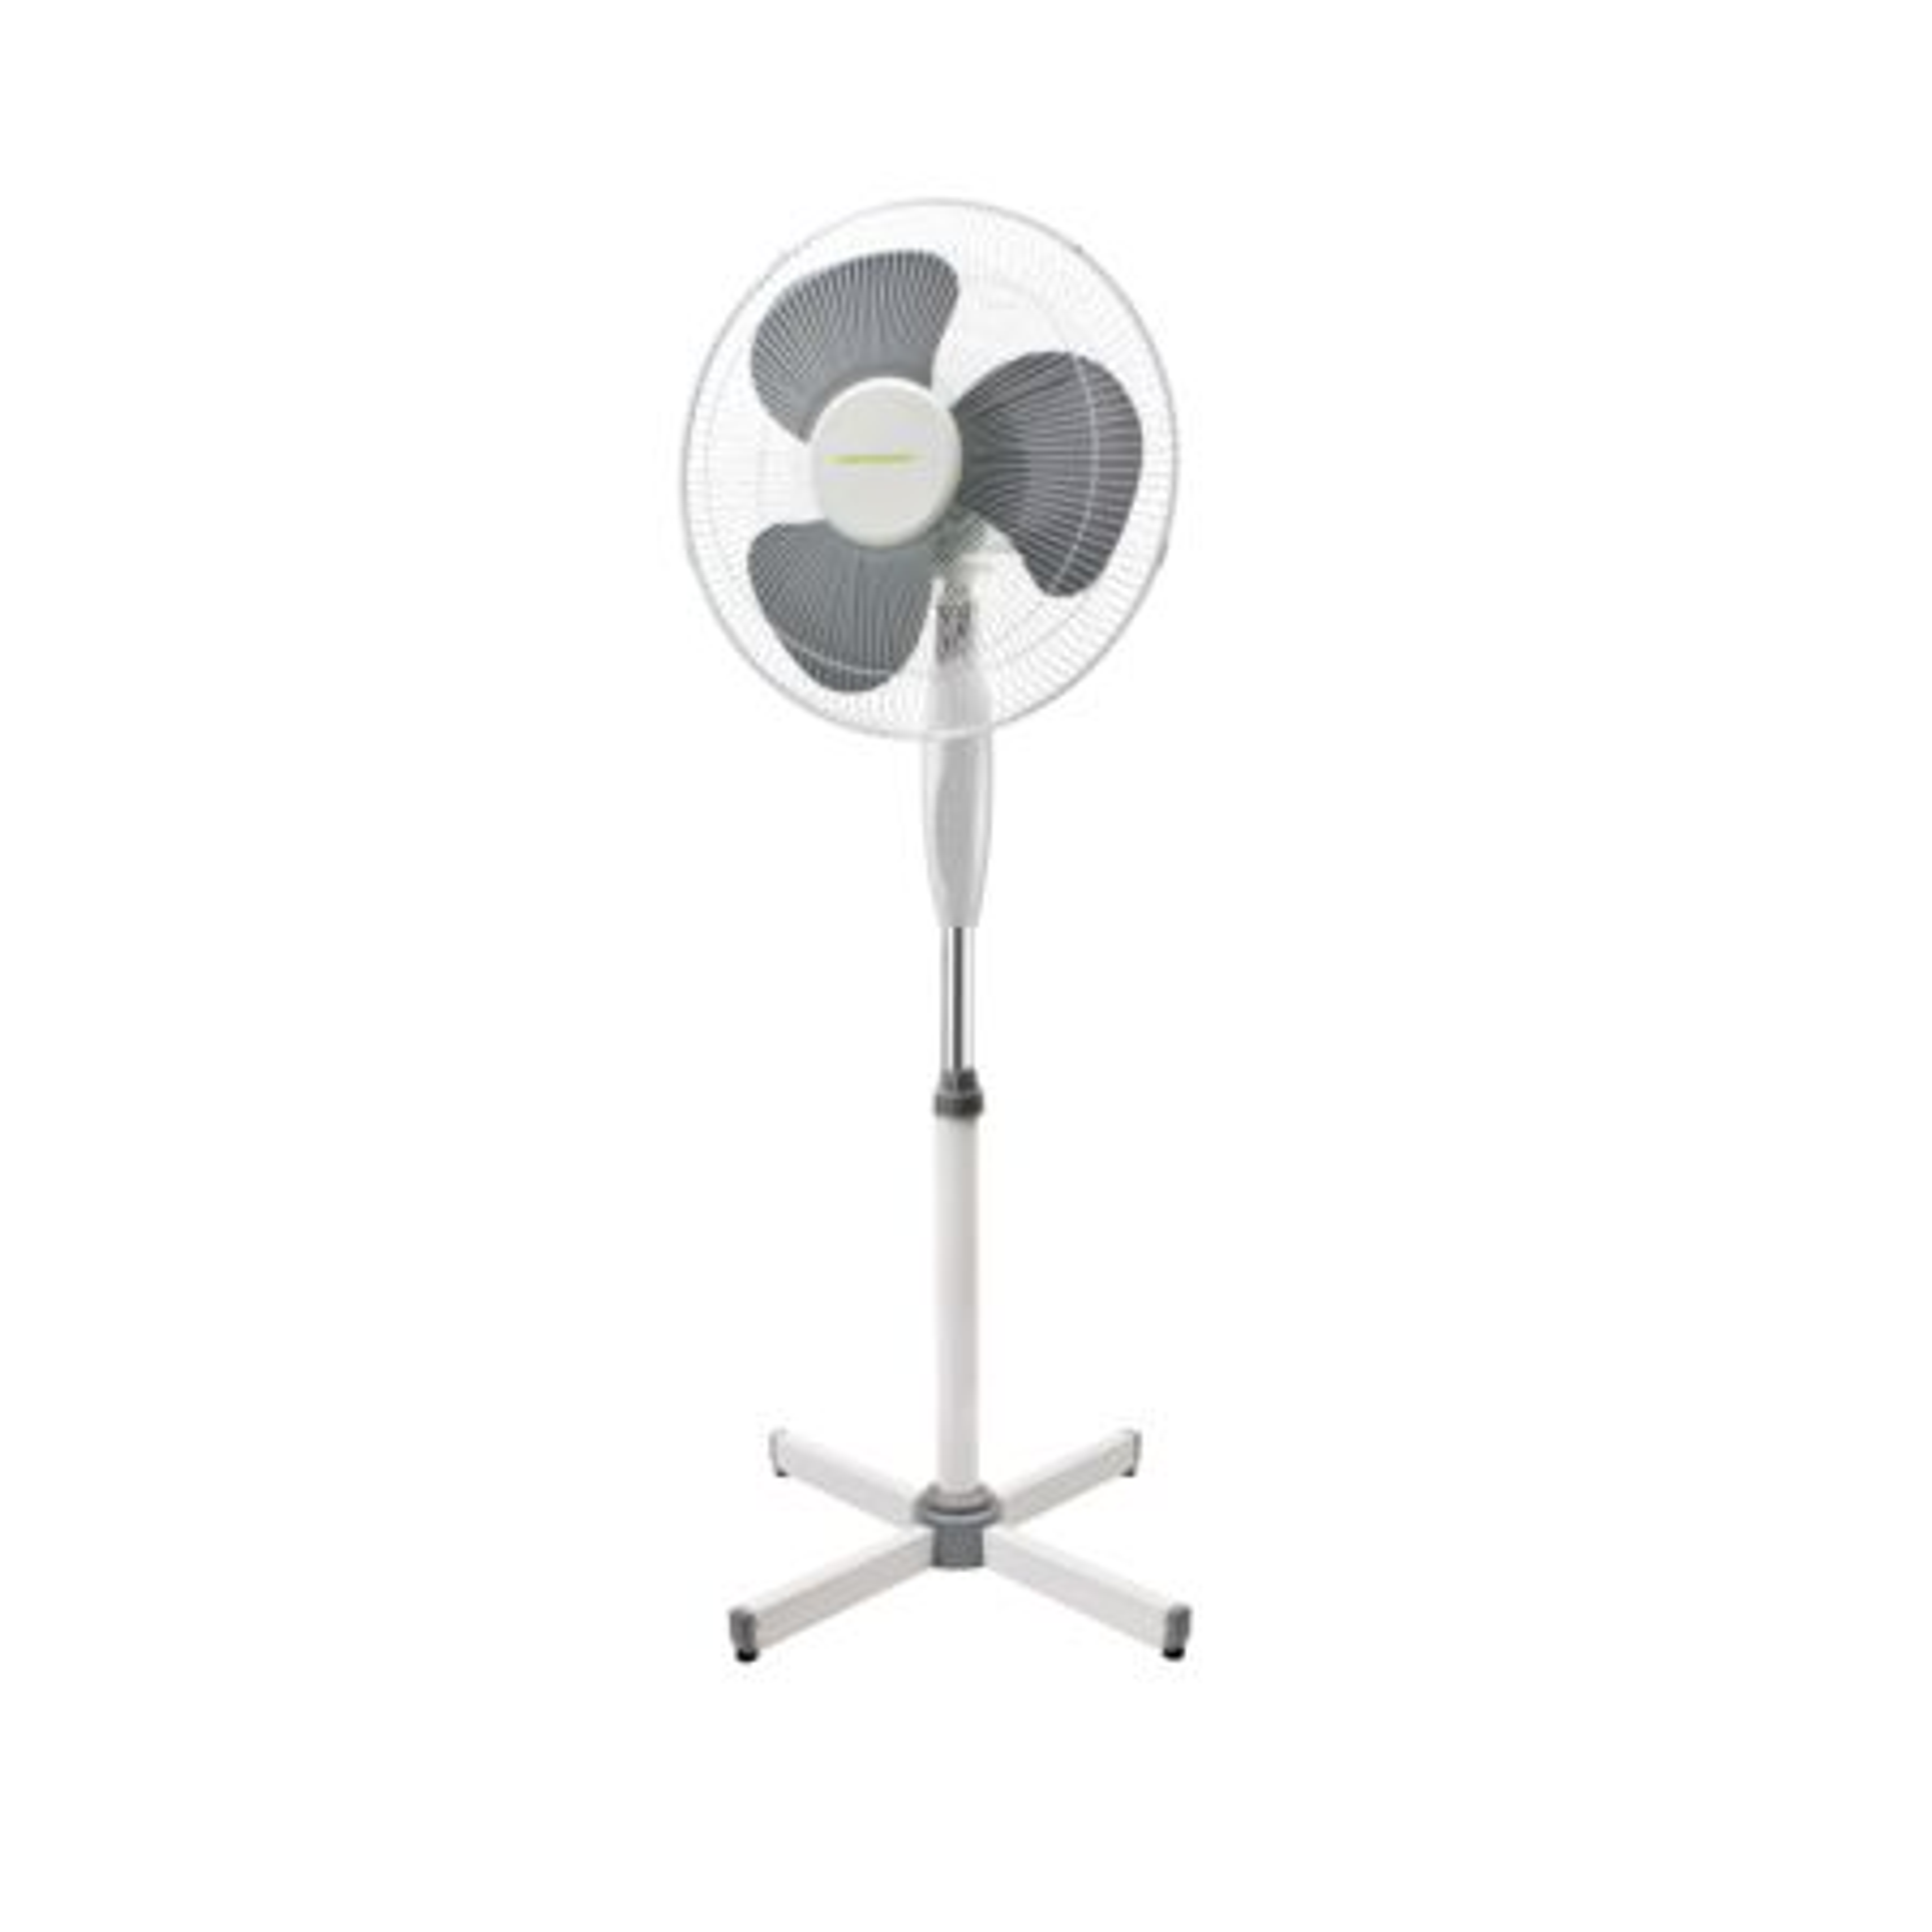 KANLUX Ventilátor VENETO 40GR stojací